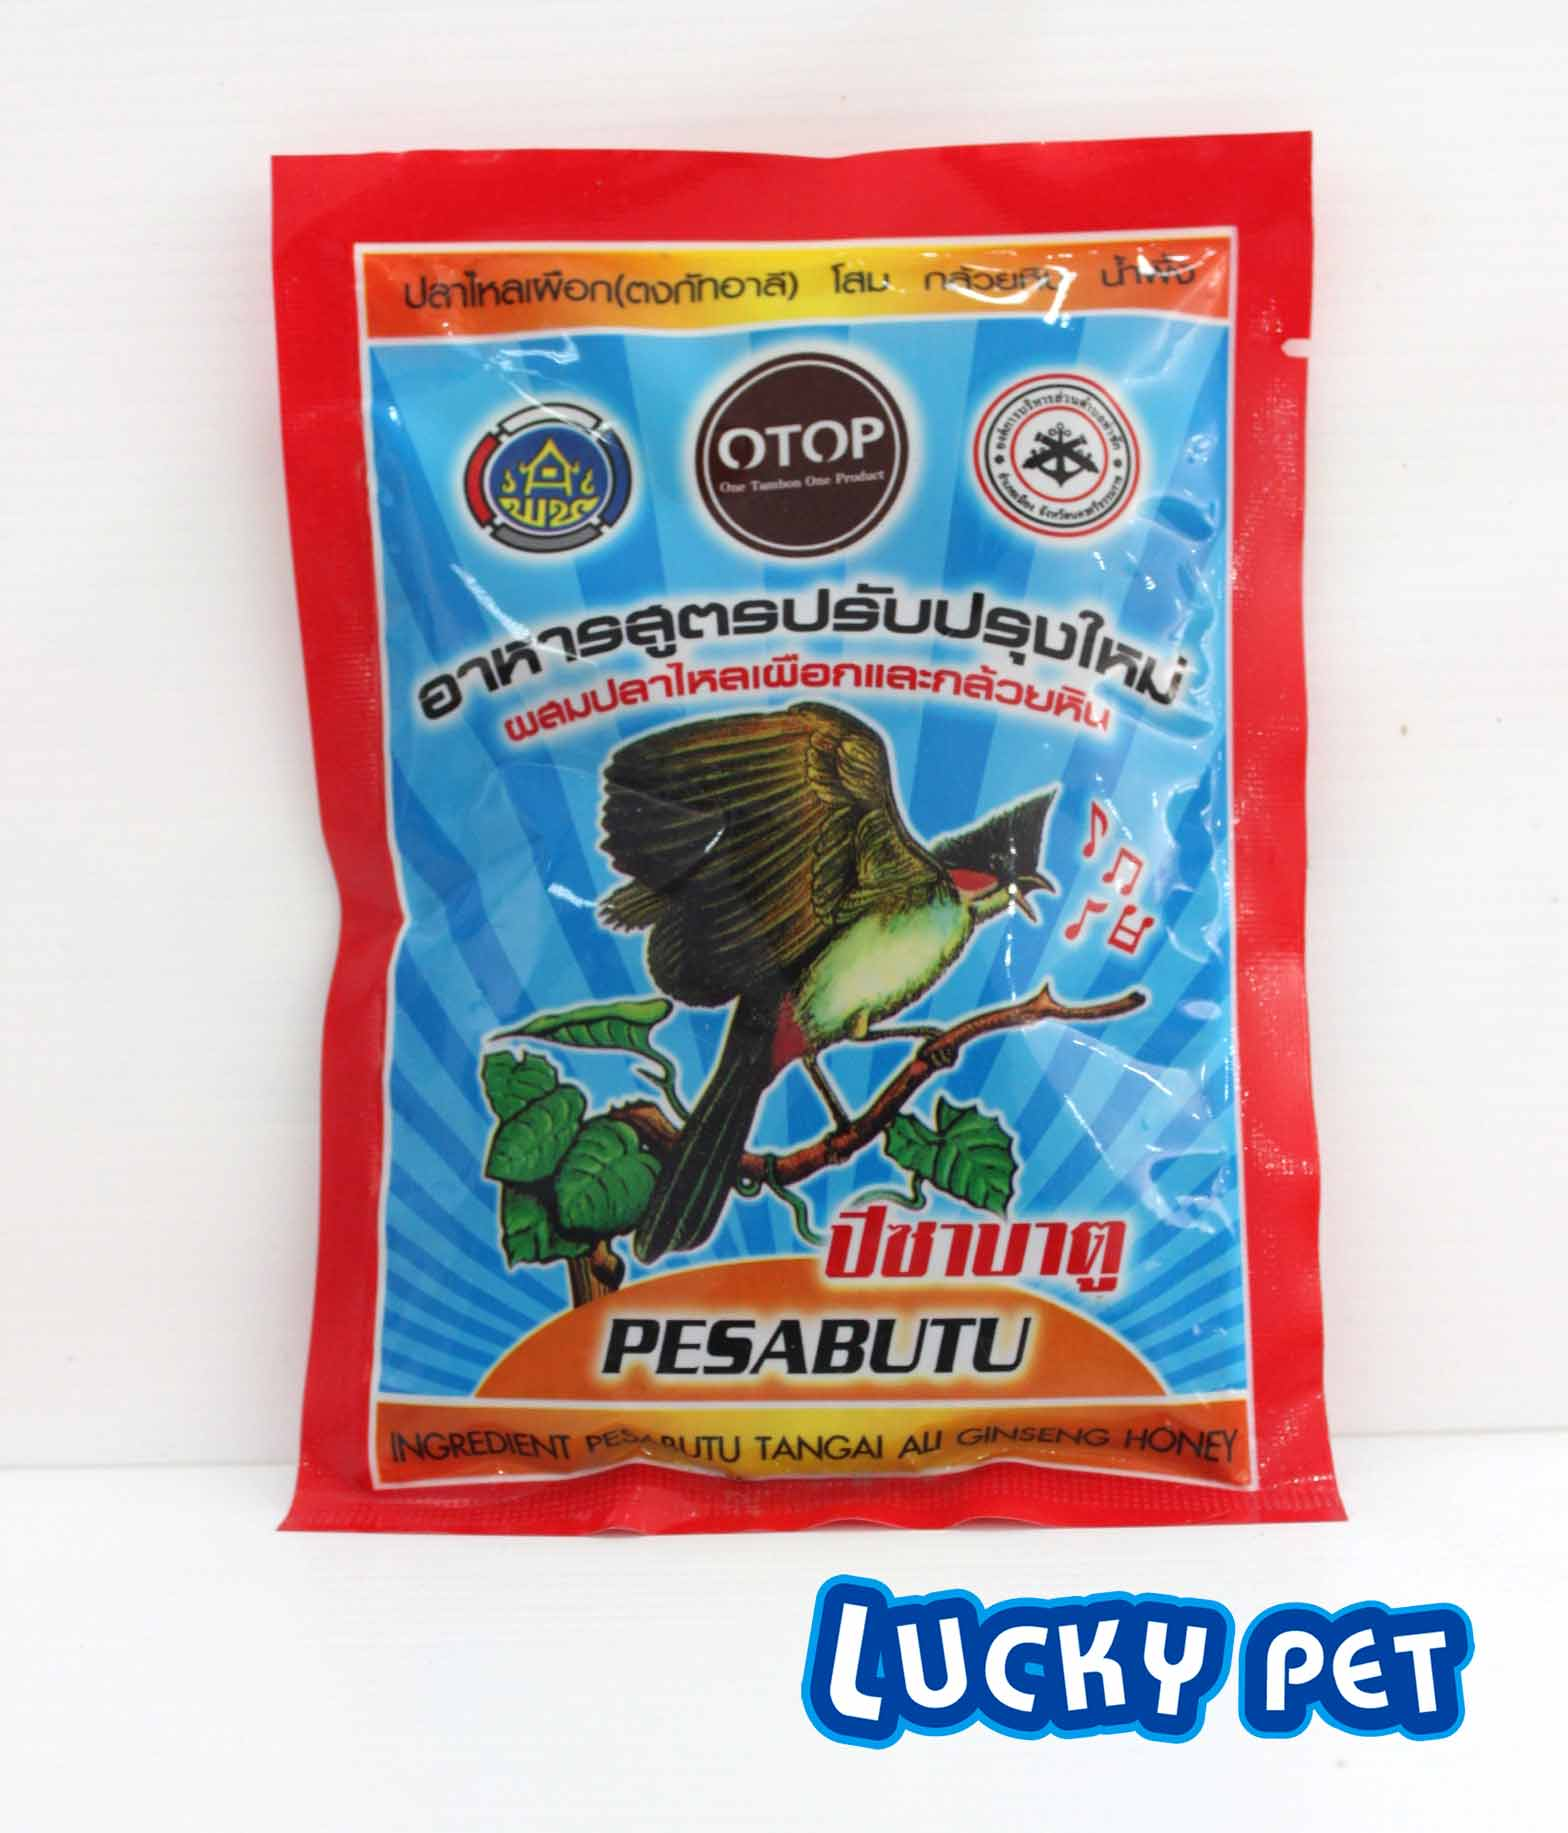 OTOP สูตรปรับปรุงใหม่ผสมปลาไหลเผือกและกล้วยหินสั่งซื้อ1โหลในราคาโหลละ 240 บาท พิเศษ!!!!สั่งซื้อ 1 ลัง/100 ซอง 1,900 บาท